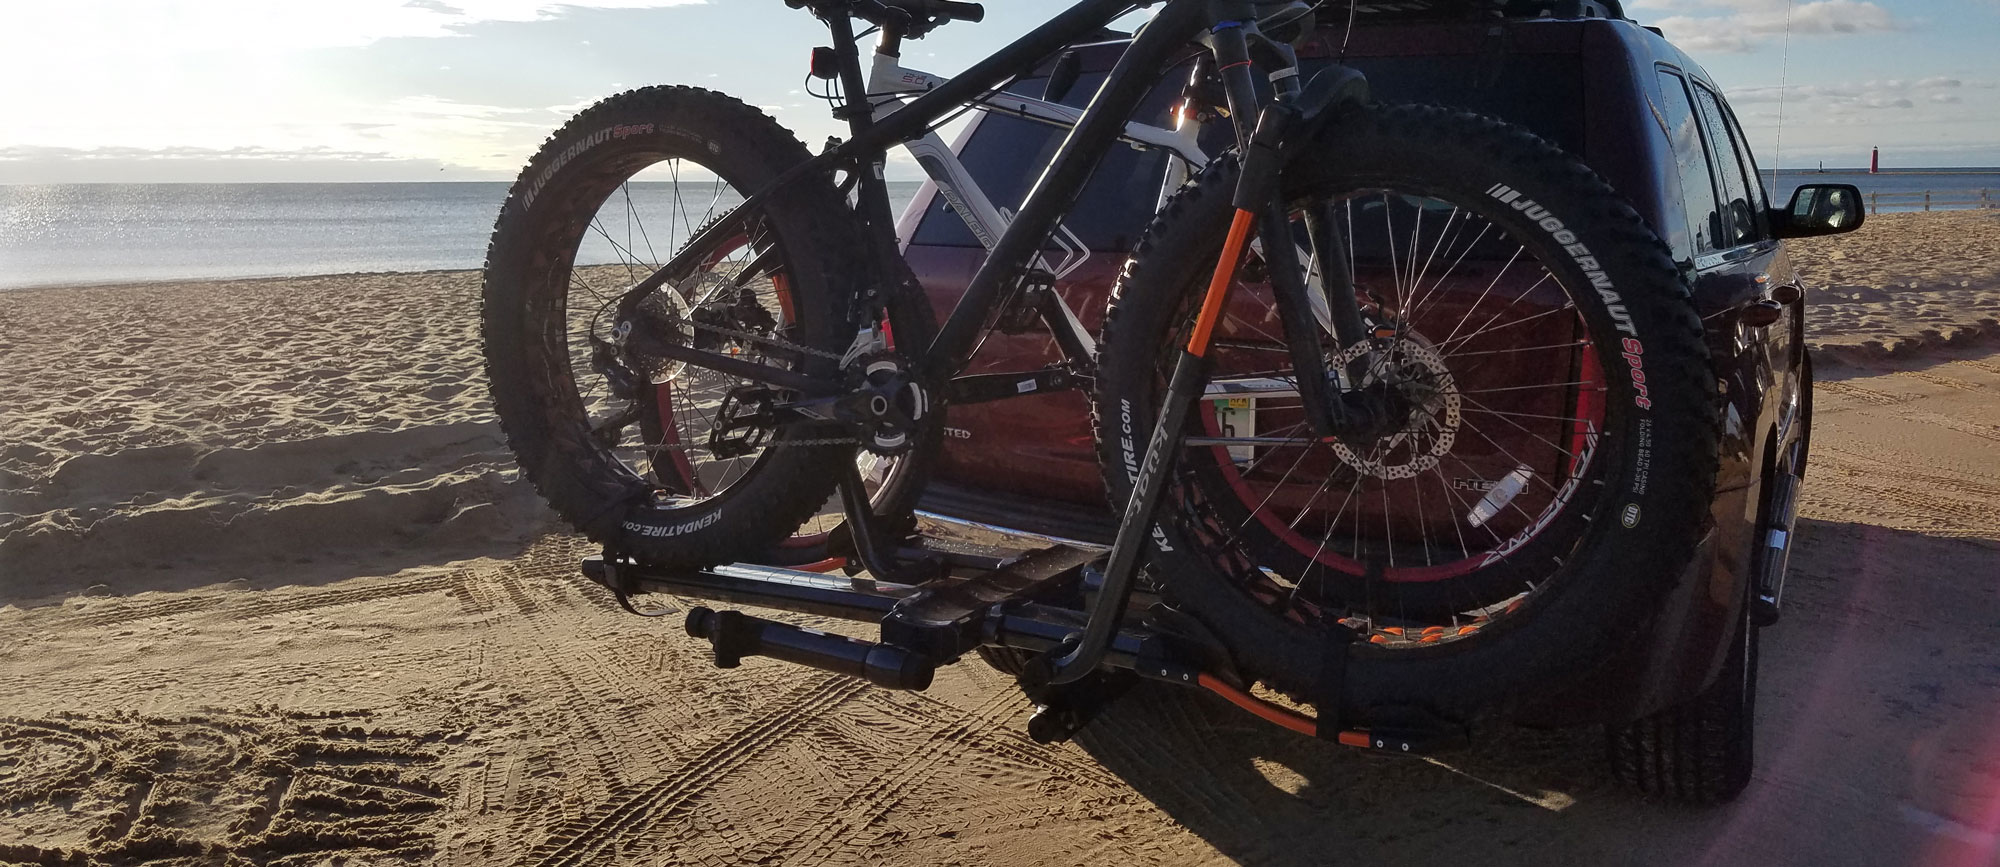 transfer plus hitch nv black metallic kuat specs package beta new bikes bundle rack on add bike i